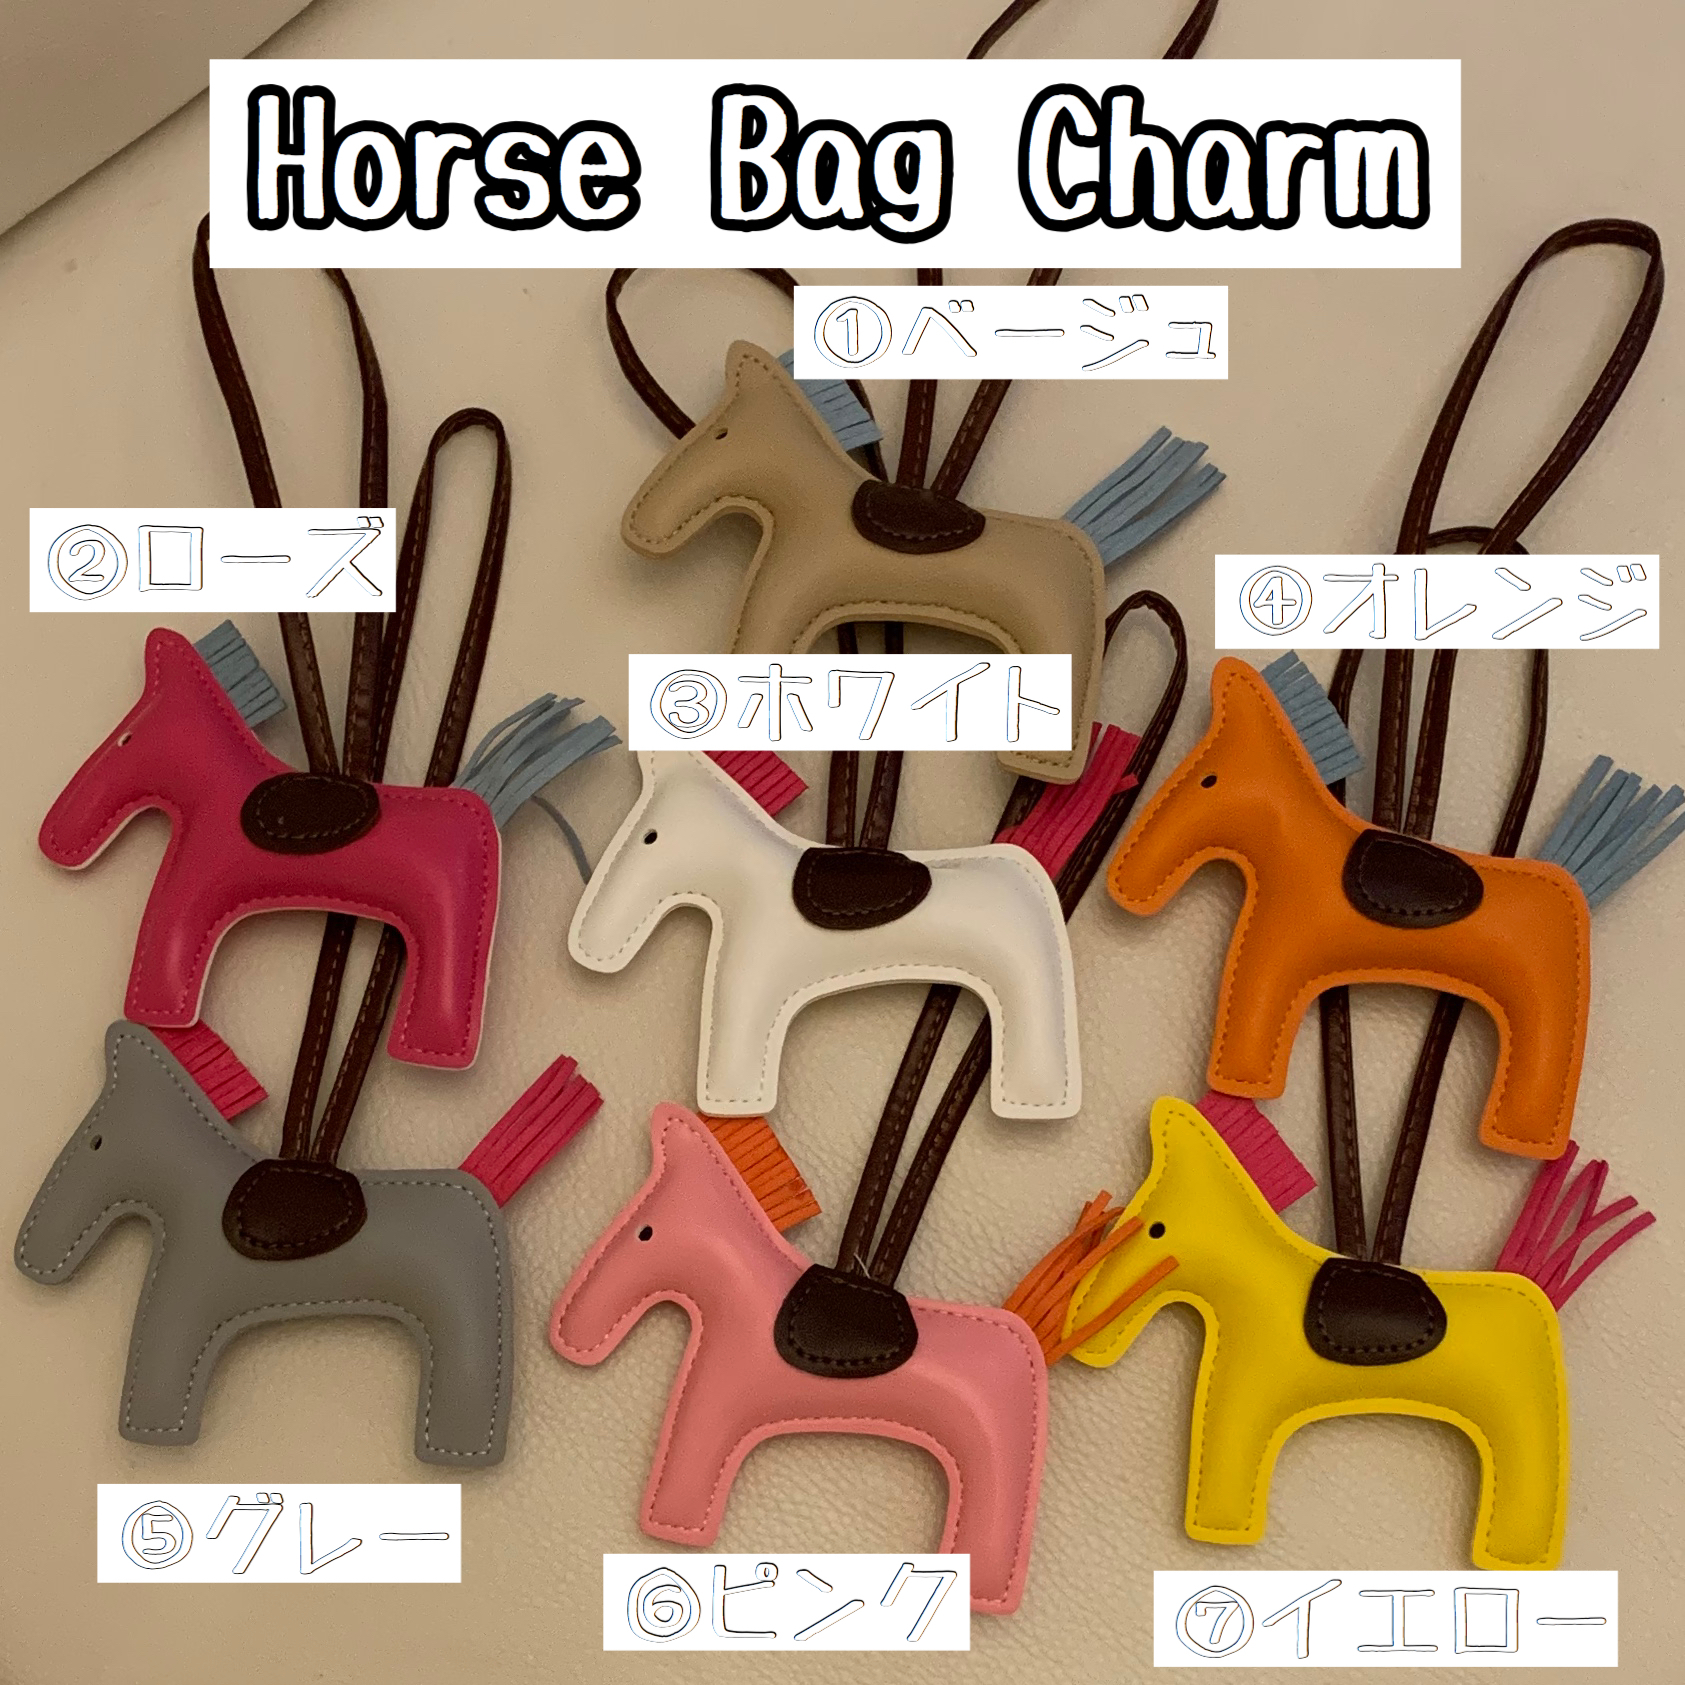 Horse Bag Charmホースバッグチャーム 馬モチーフ